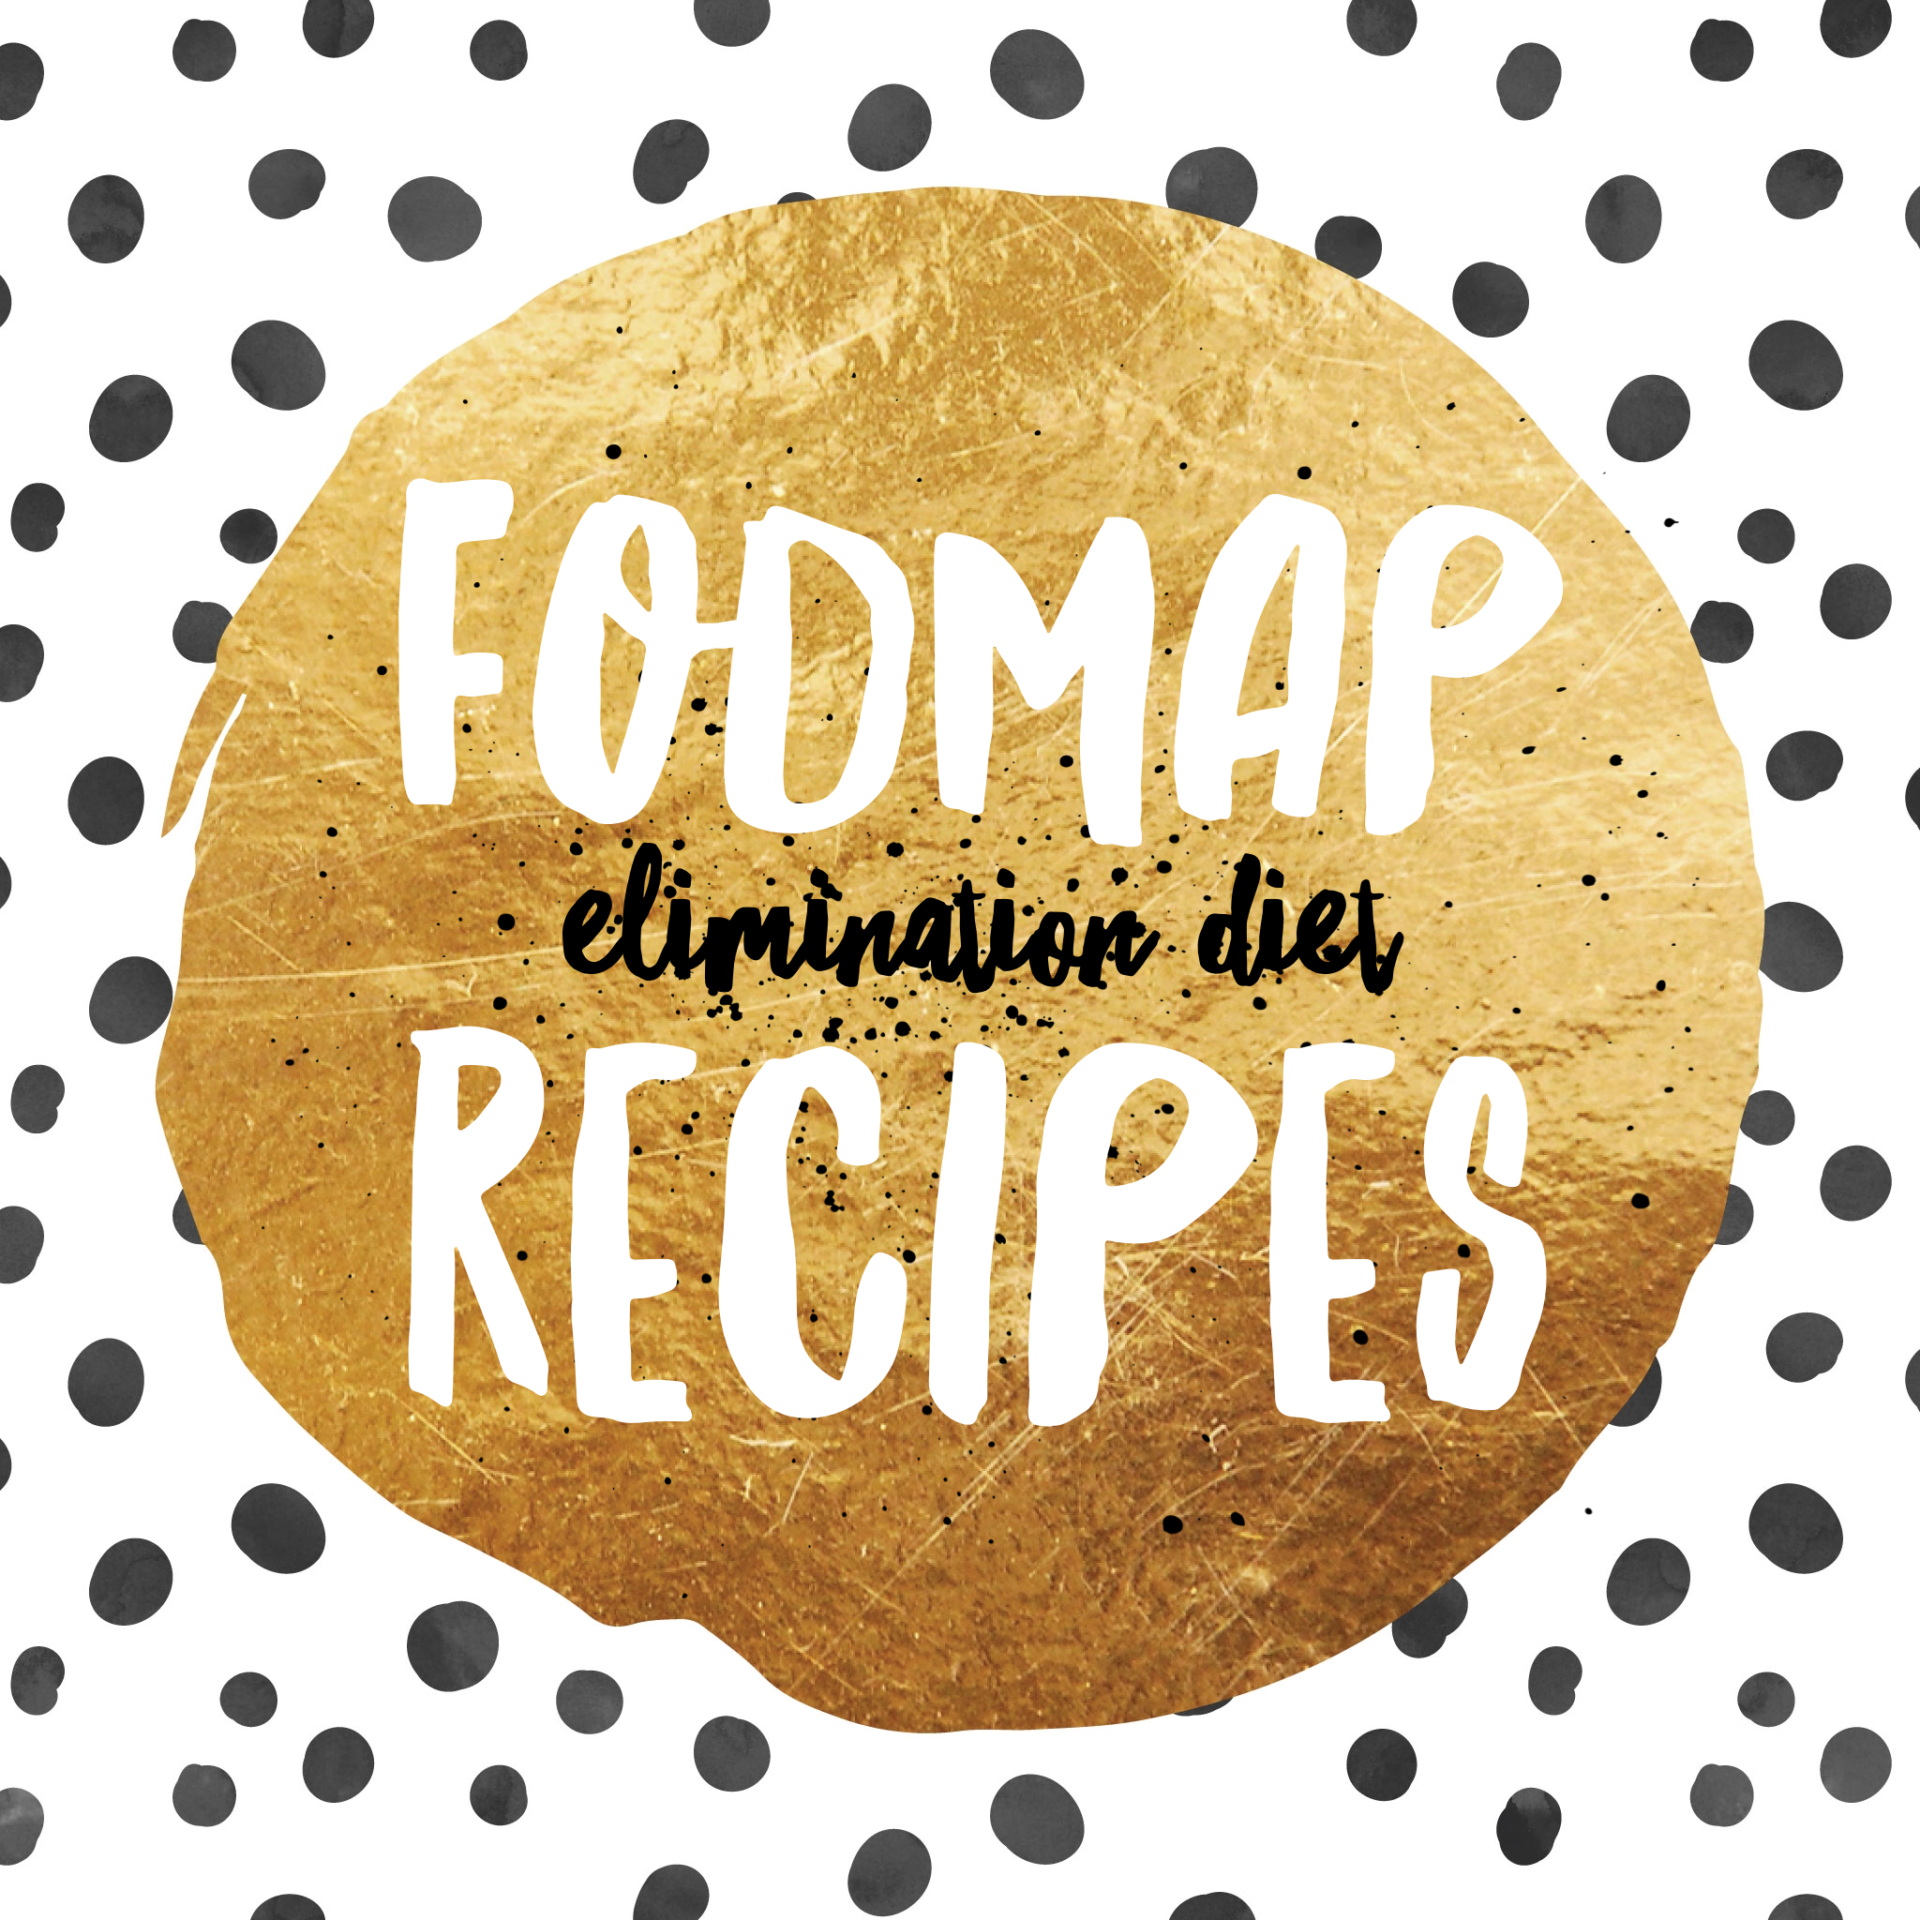 FODMAP Elimination Diet Recipes